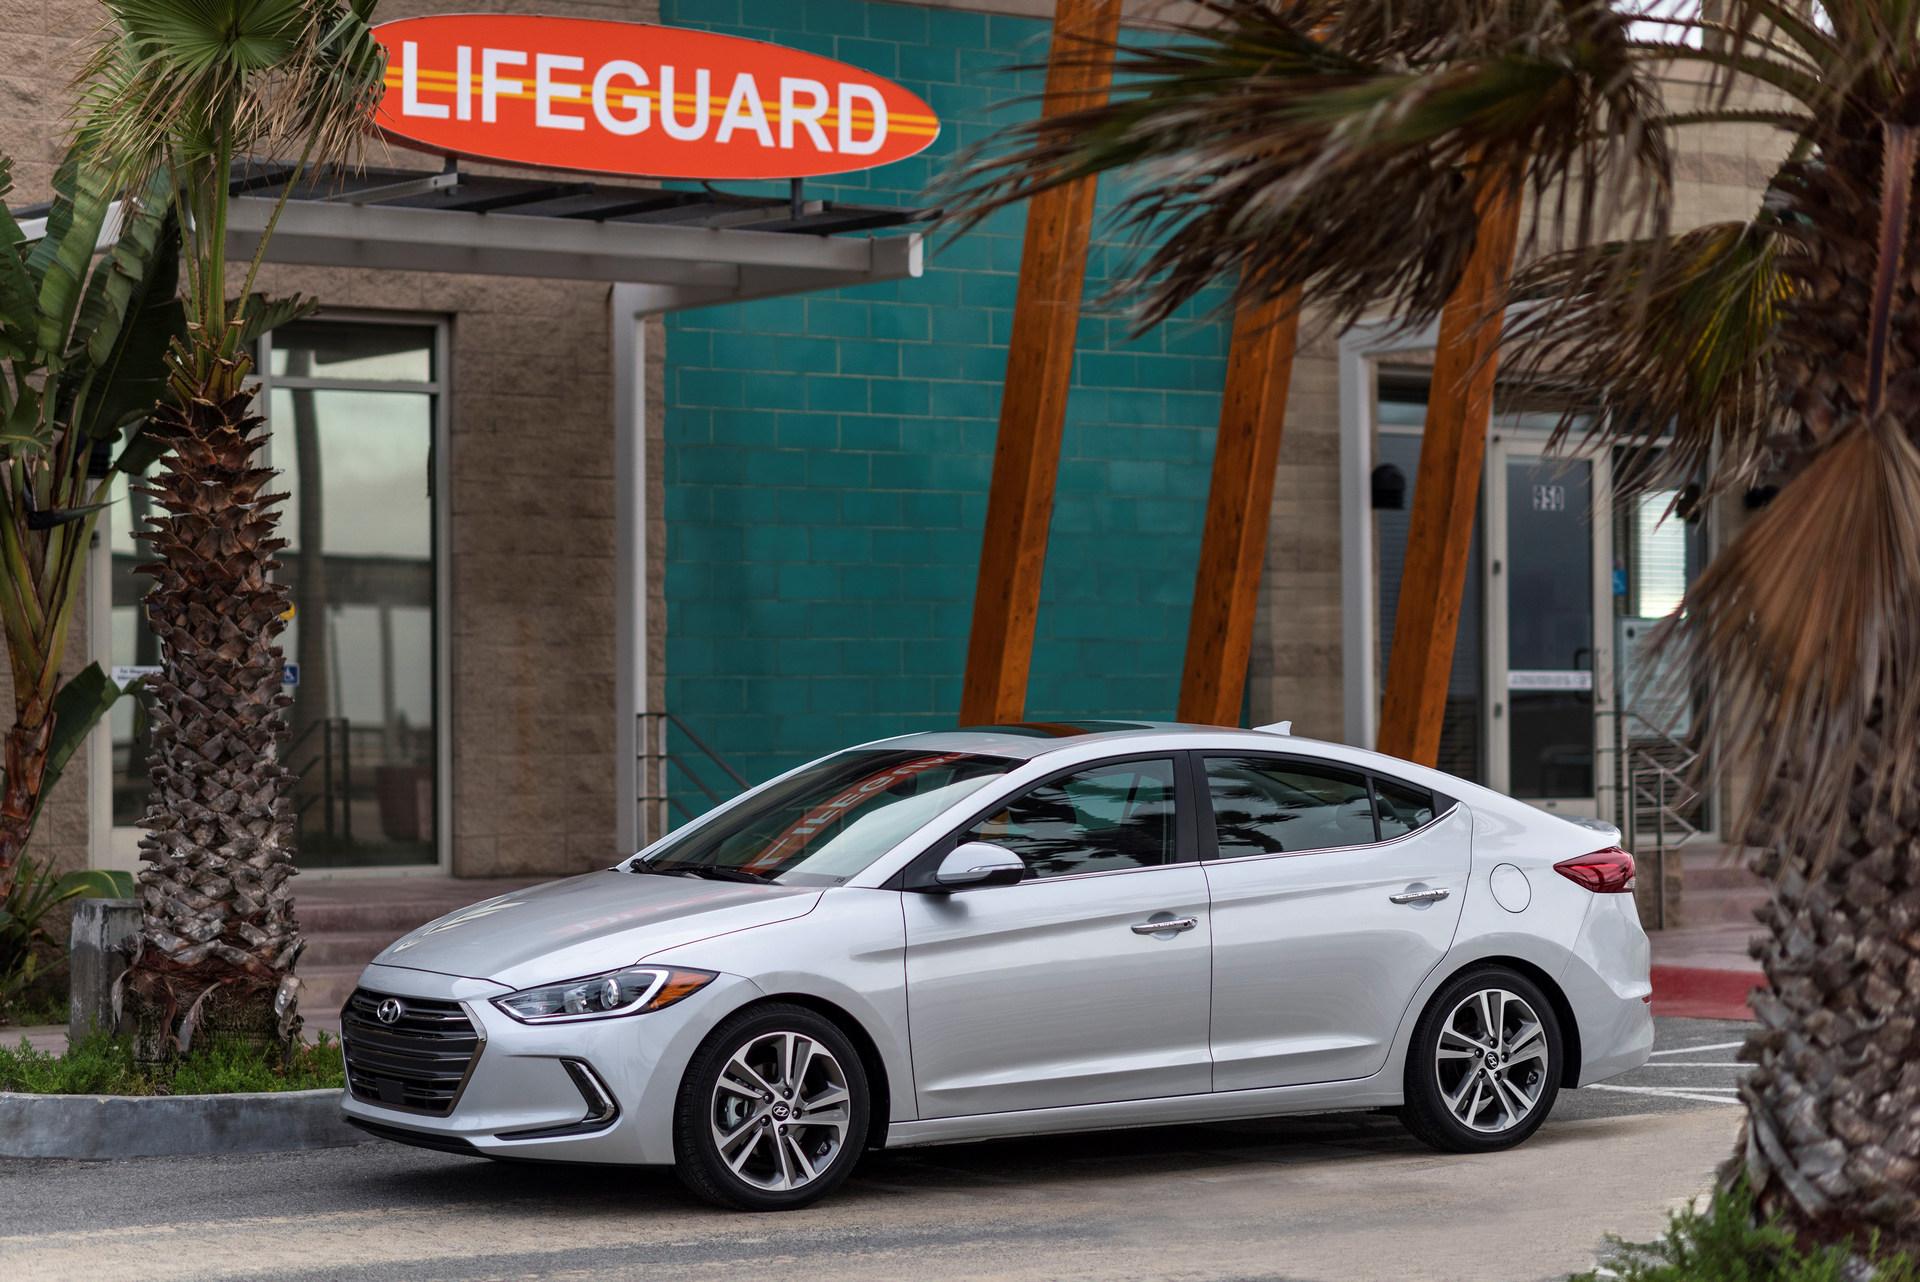 2017 Hyundai Elantra Sedan © Hyundai Motor Company